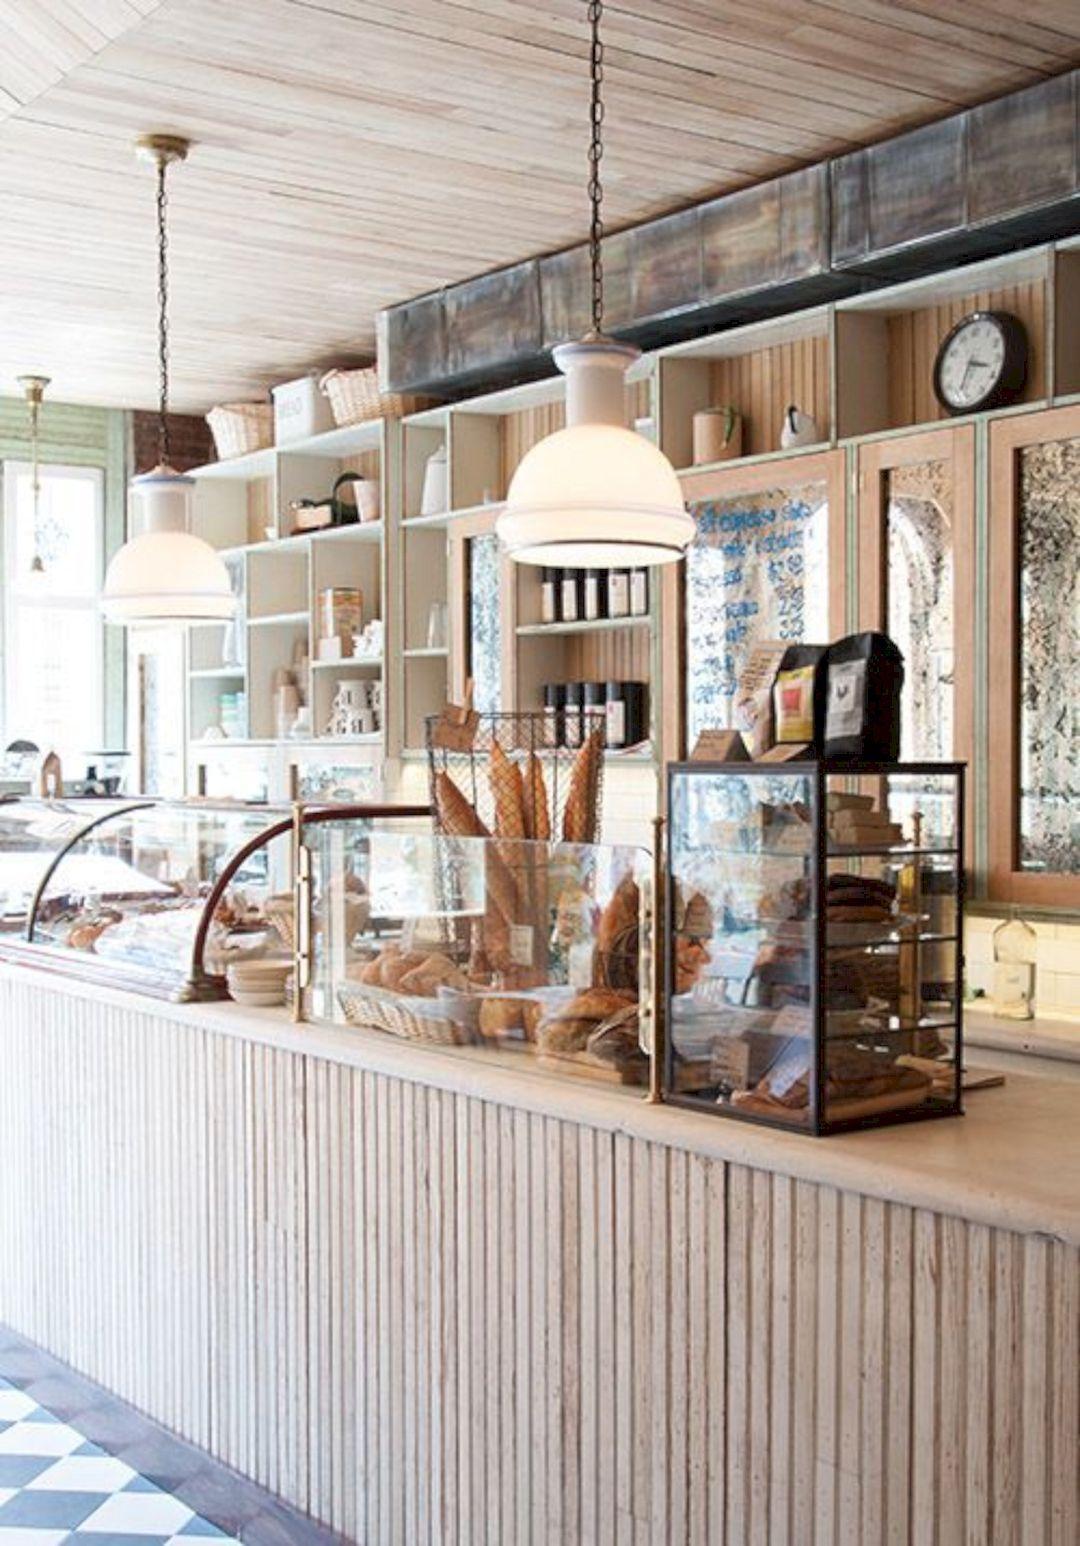 16 Small Cafe Interior Design Ideas Gorgeous Interior Ideas Cafe